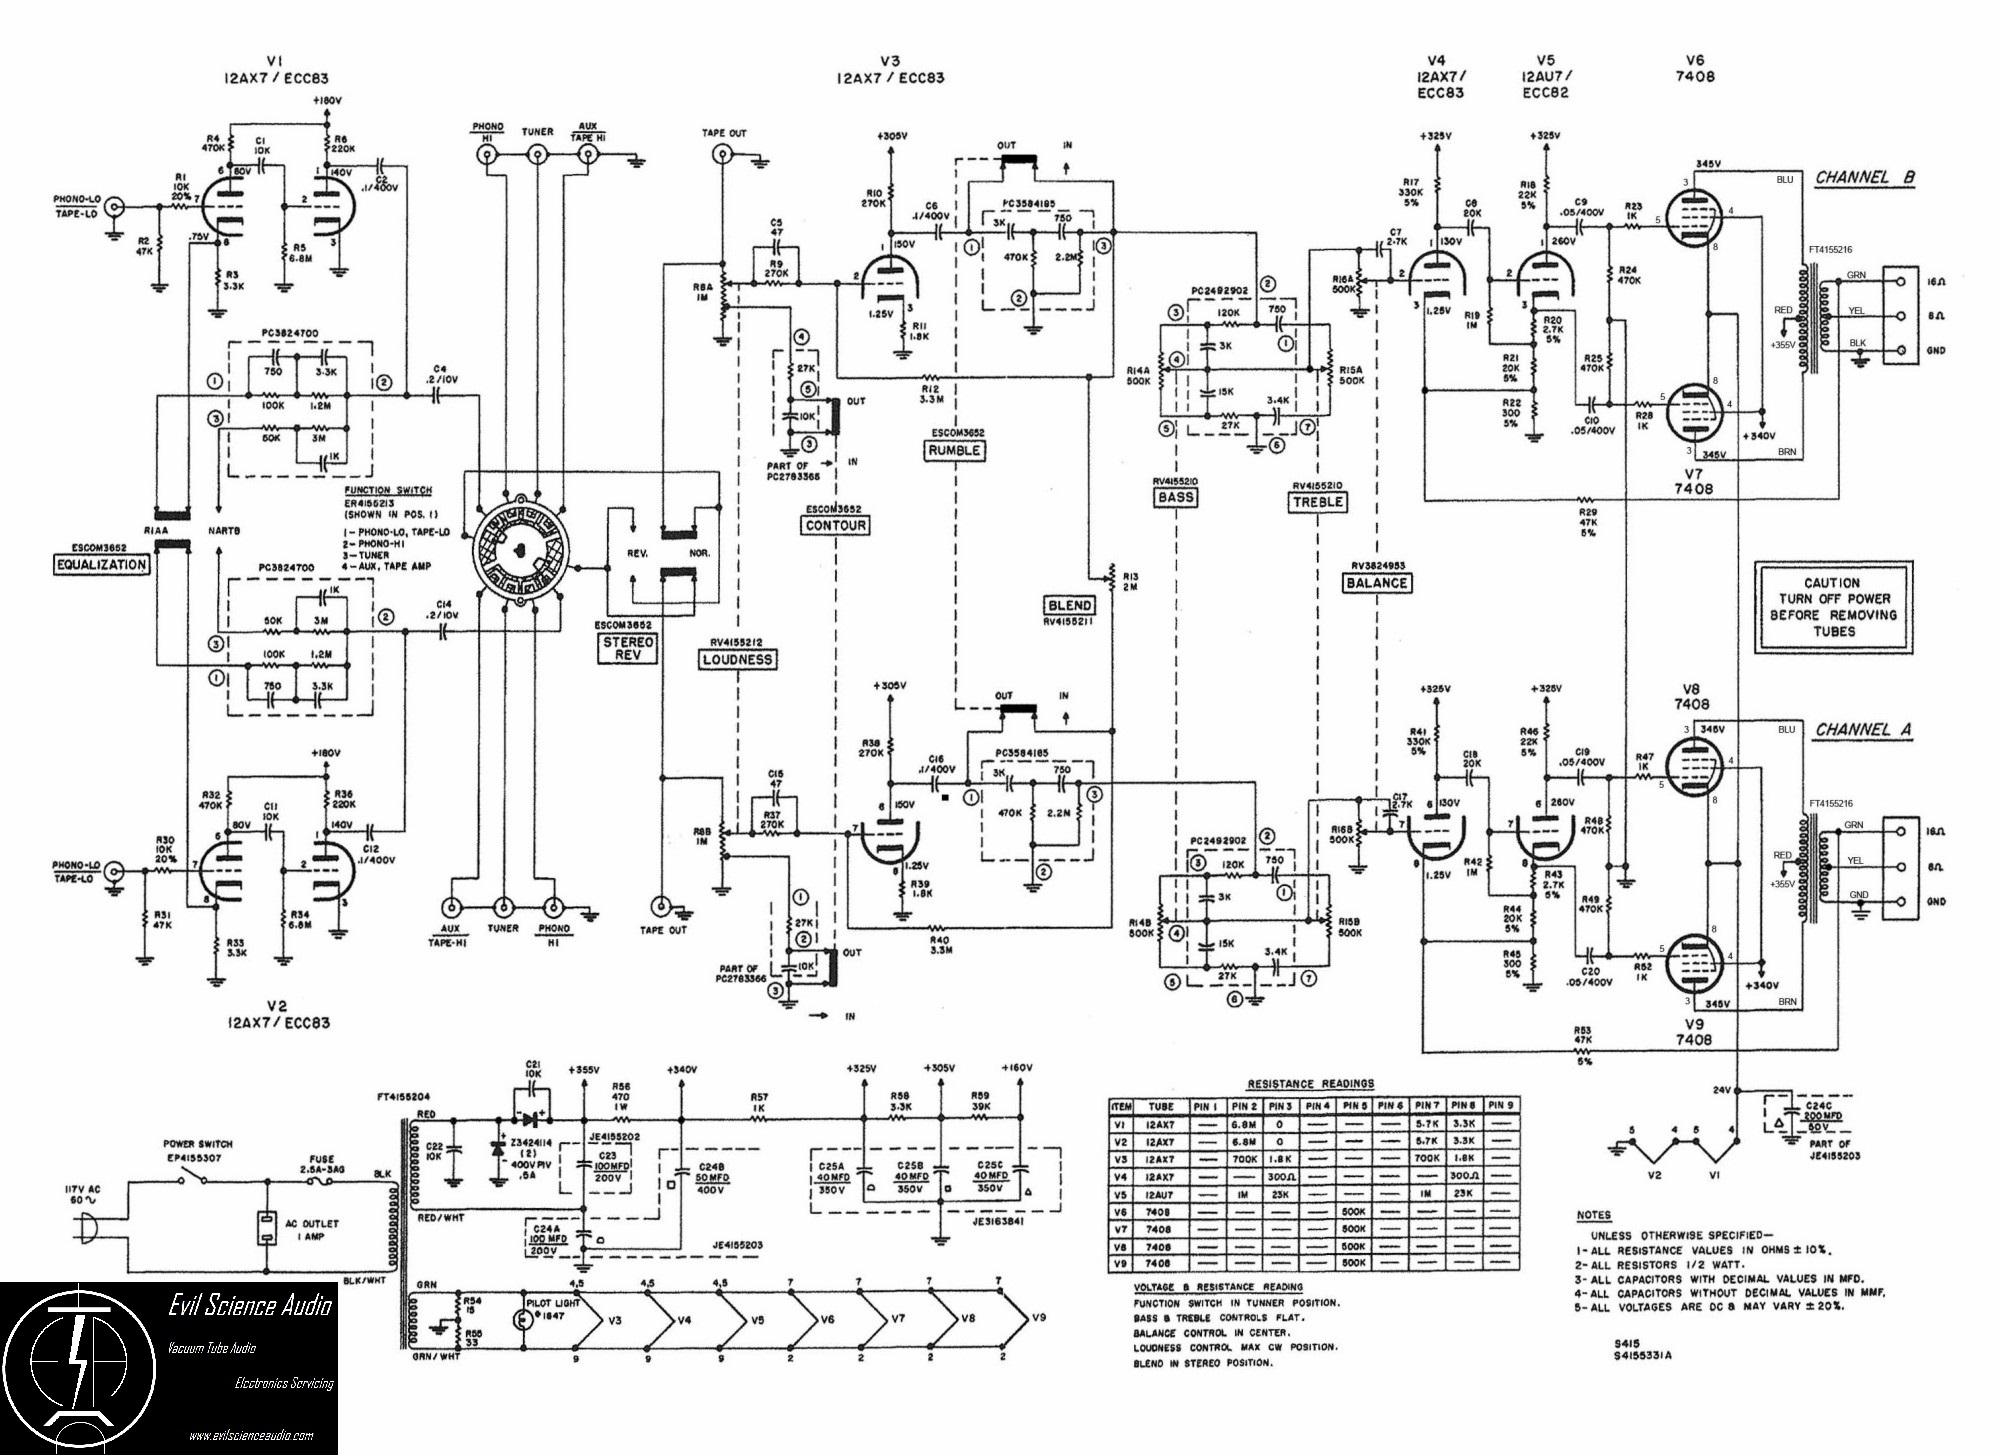 Harman Wiring Diagram - Wiring Diagram Site on